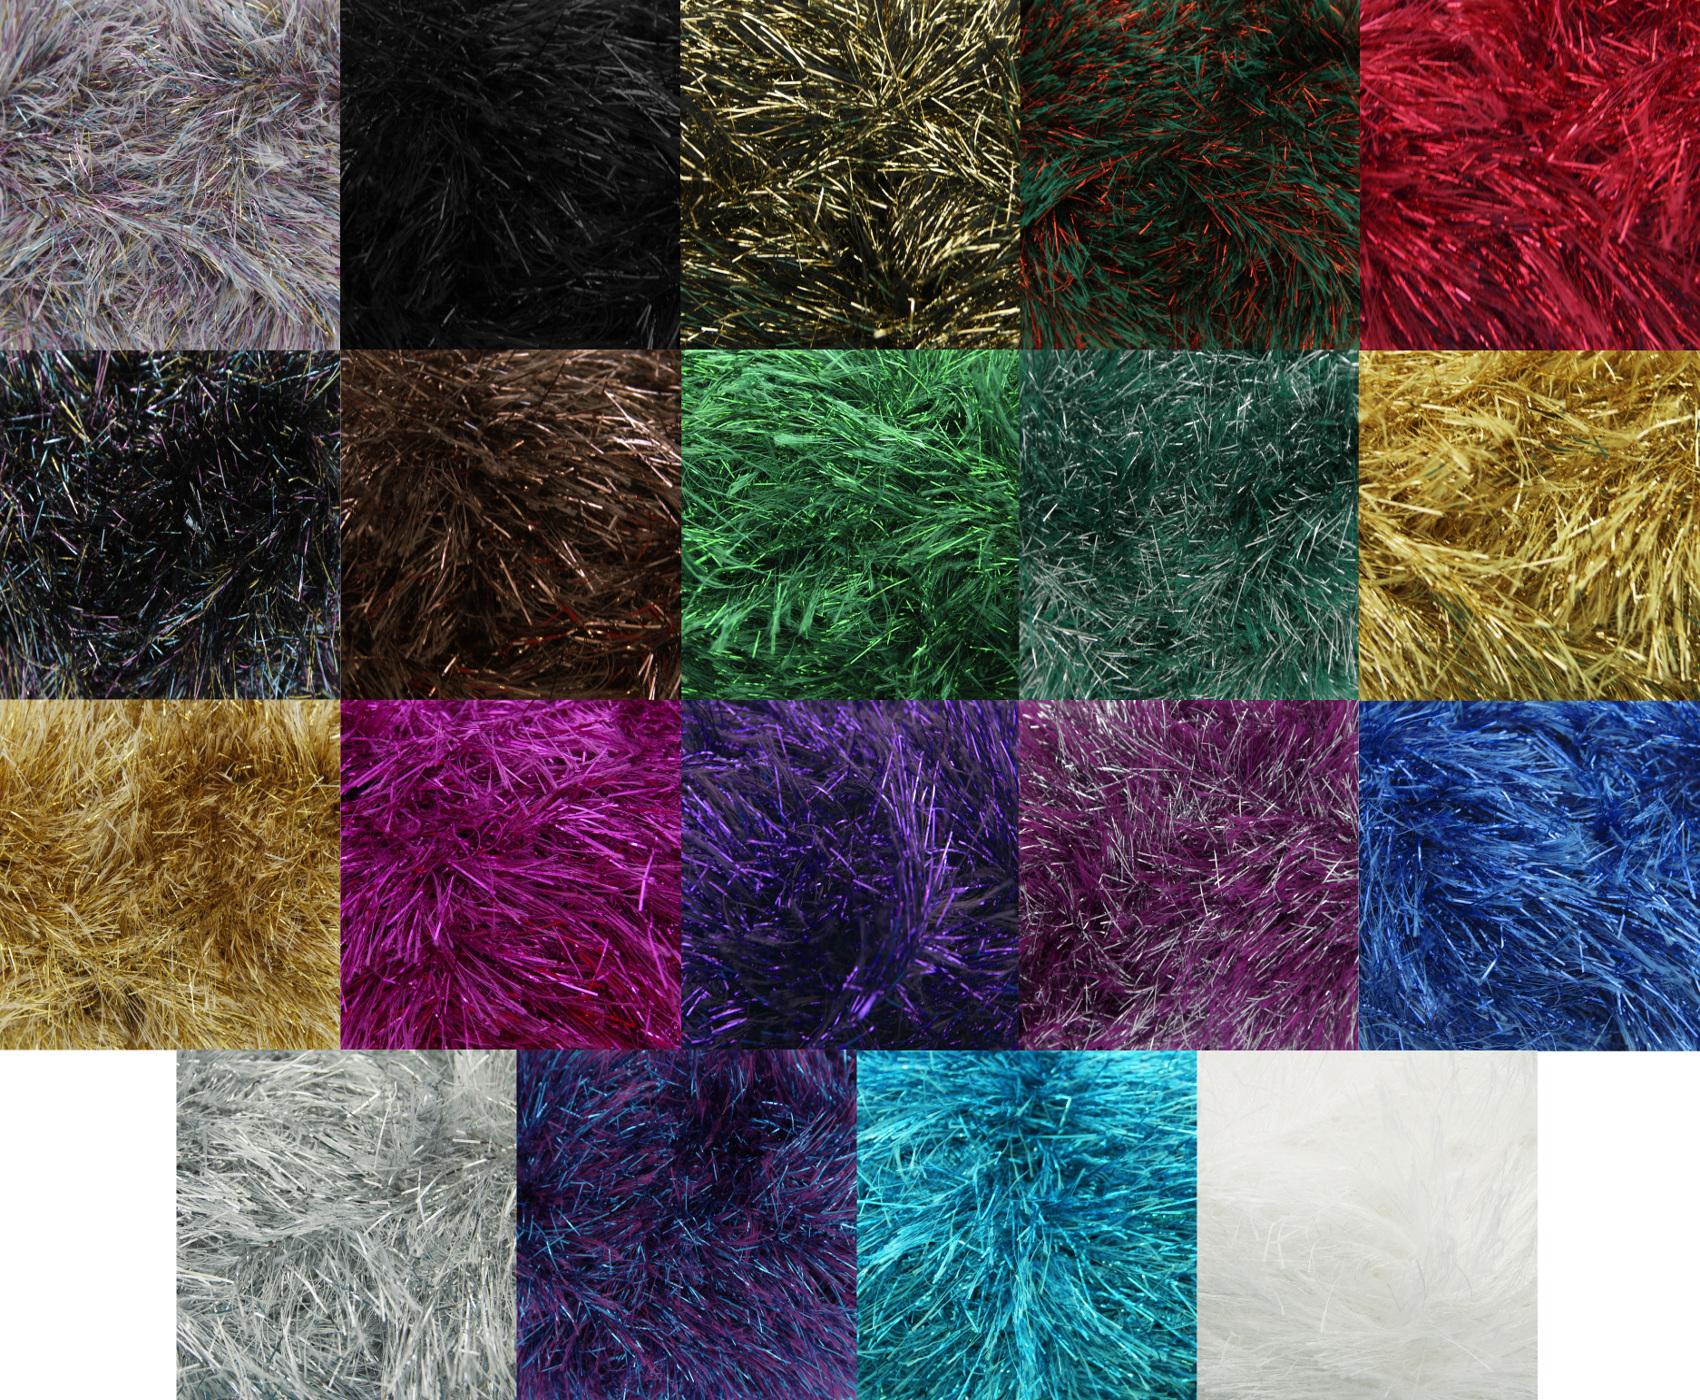 Free King Cole Knitting Patterns : King Cole 50g Ball Tinsel Chunky Knitting Wool Festive Yarn Free Scarf Patter...